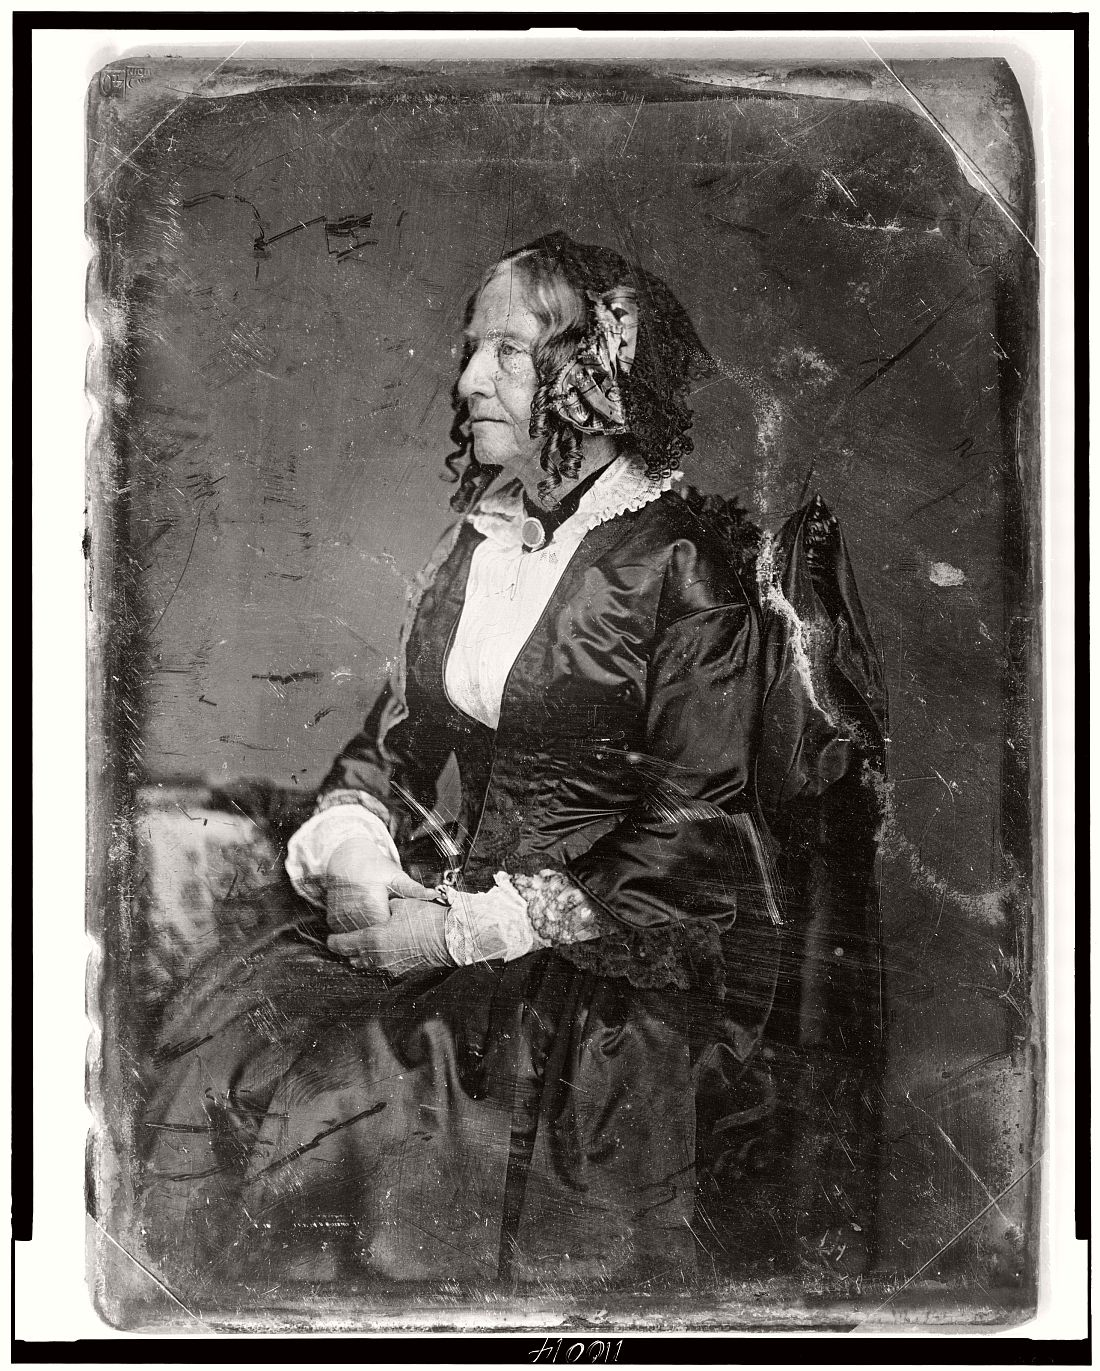 vintage-daguerreotype-portraits-from-xix-century-1844-1860-47